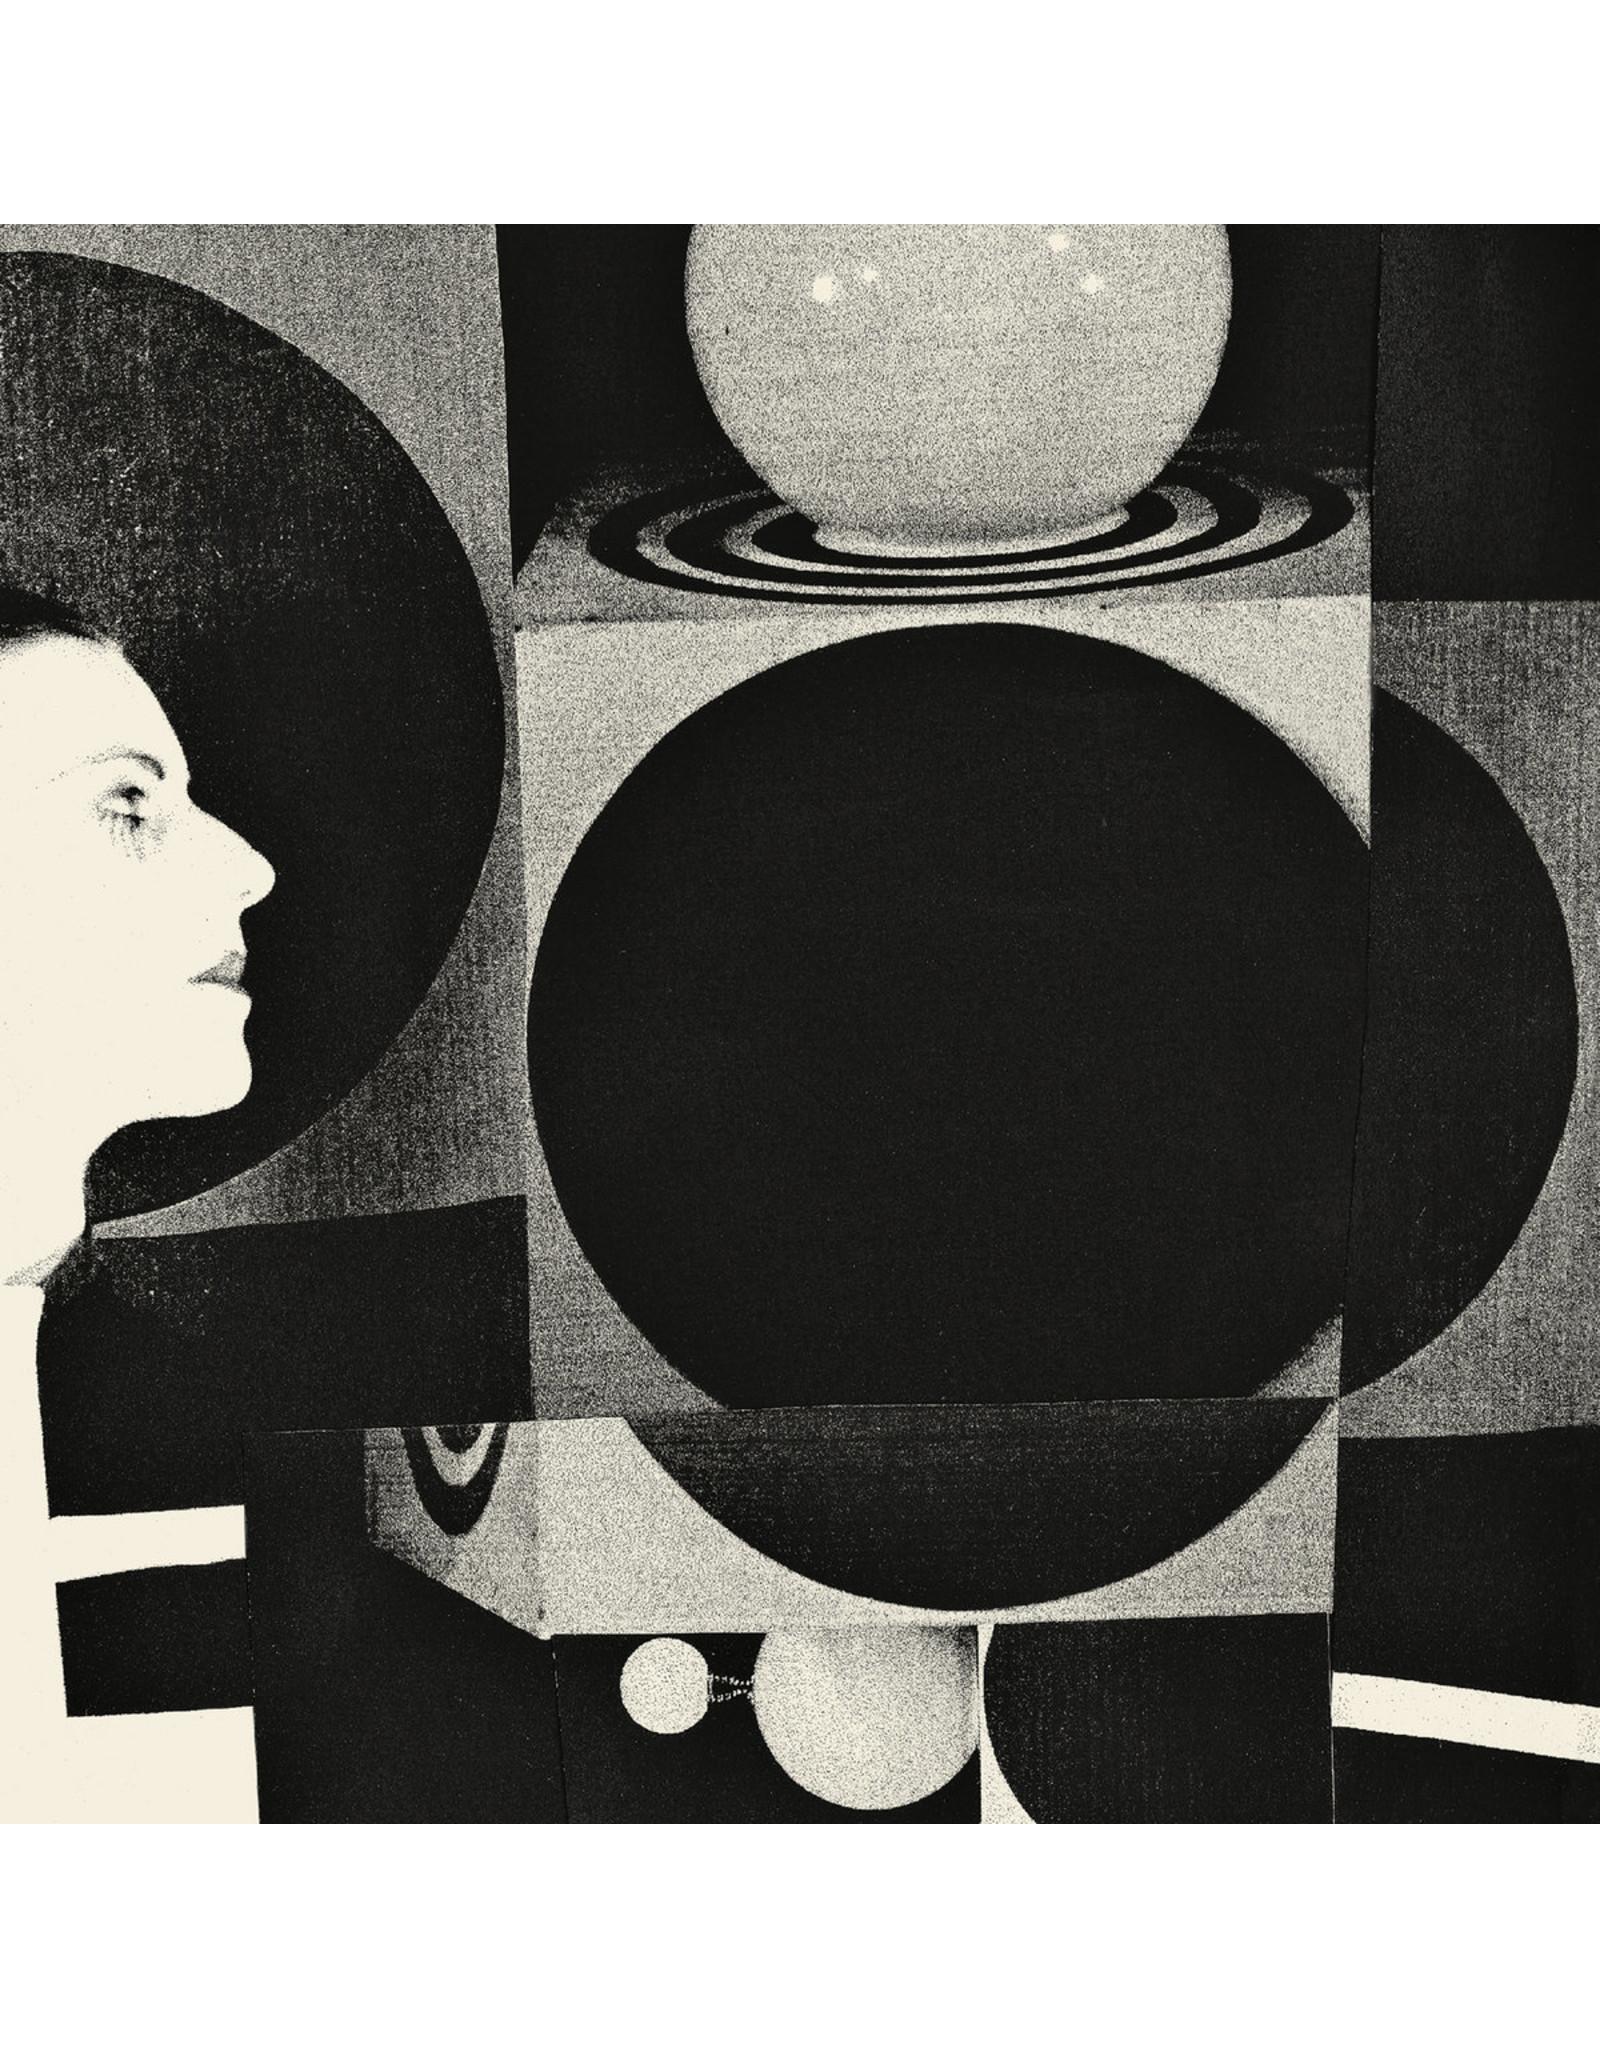 New Vinyl Vanishing Twin - The Age Of Immunology LP